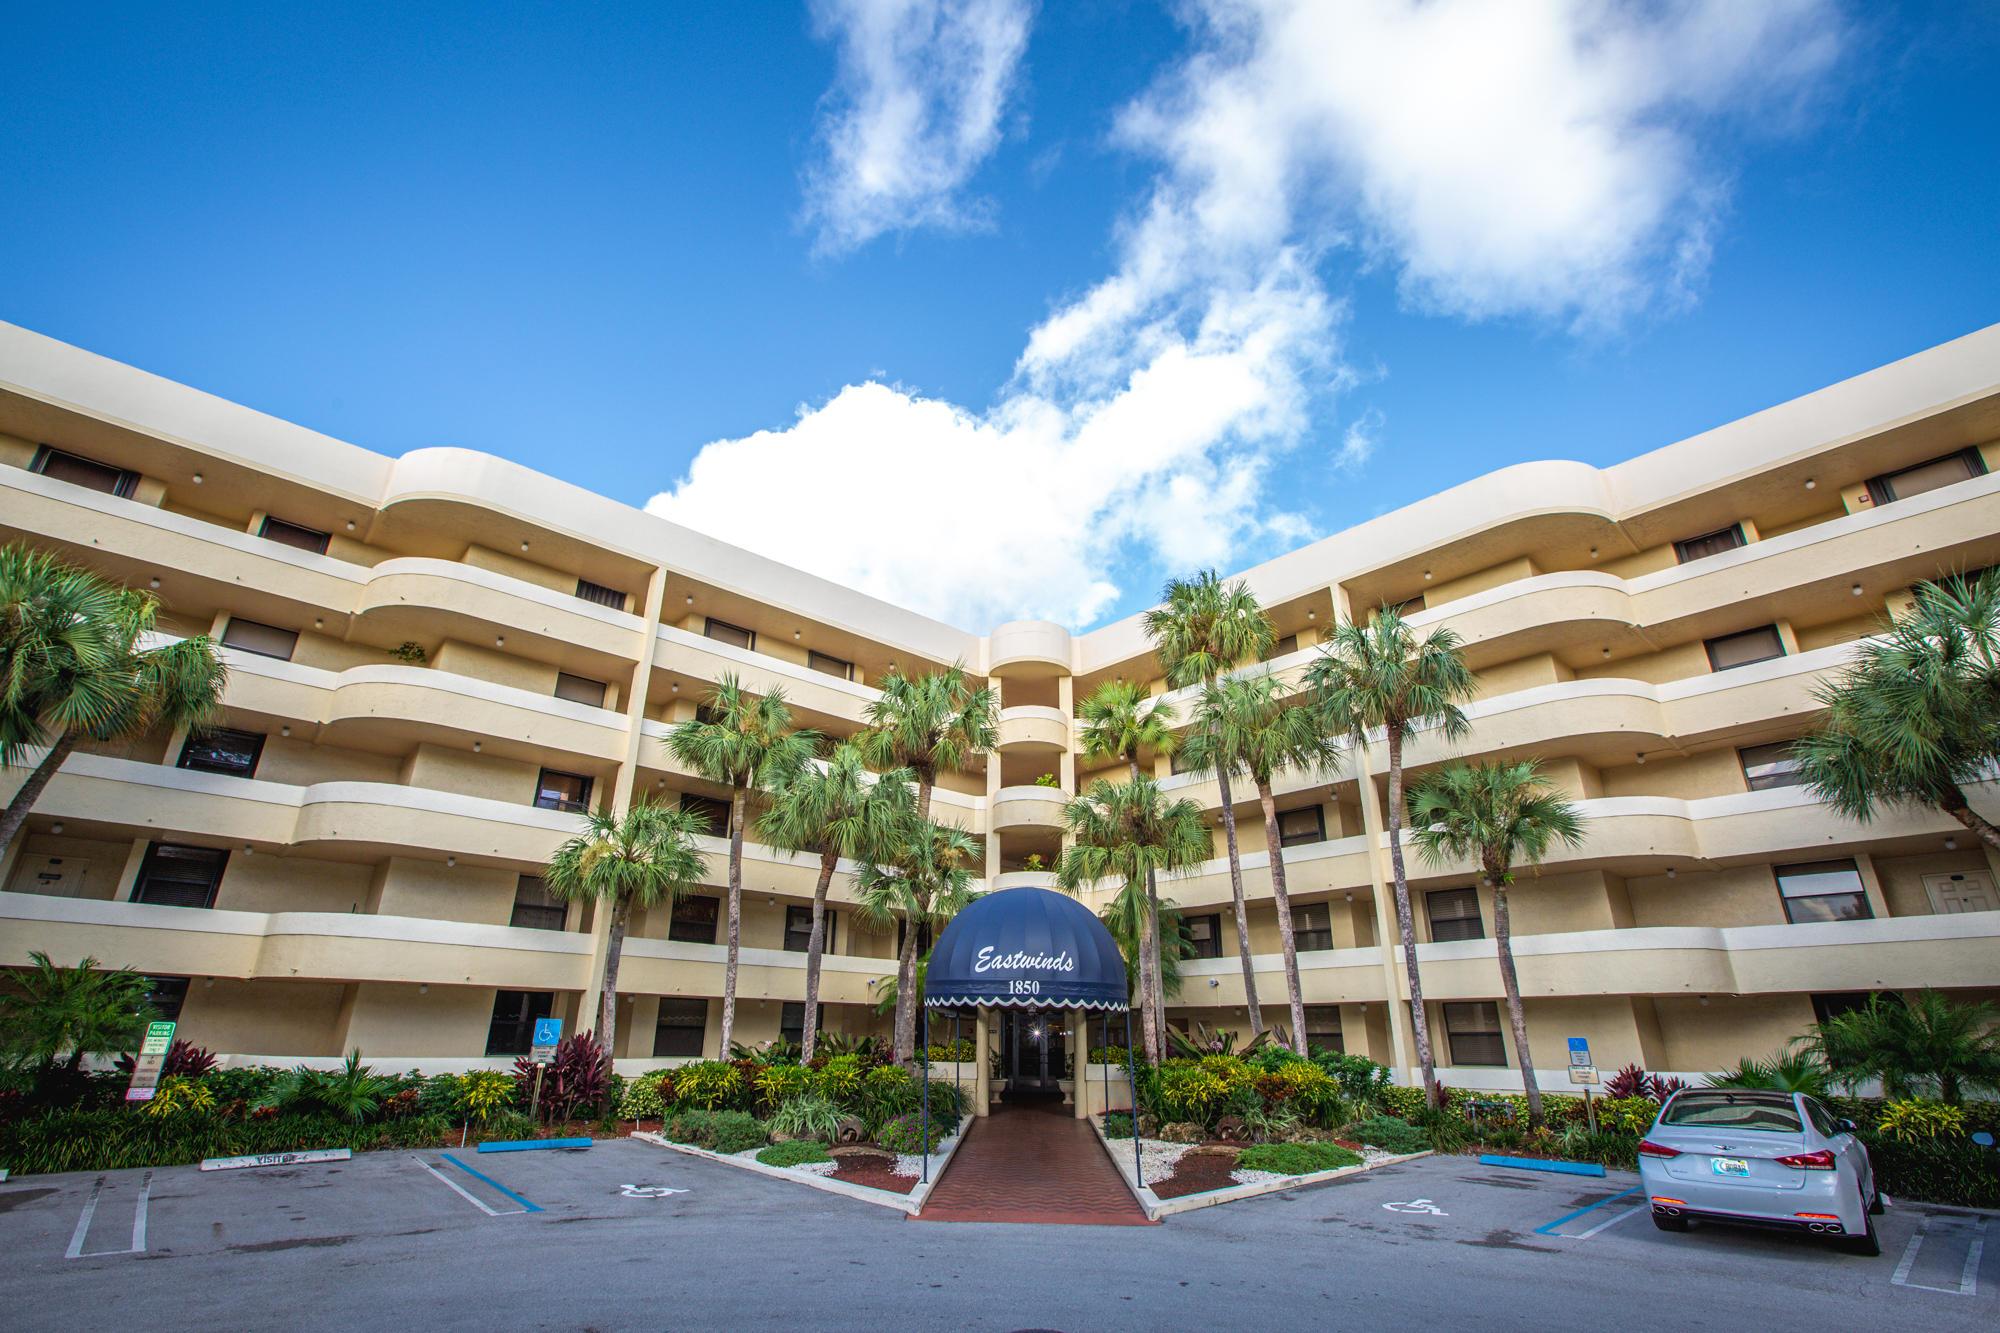 1850 Homewood 107 Delray Beach FL 33445